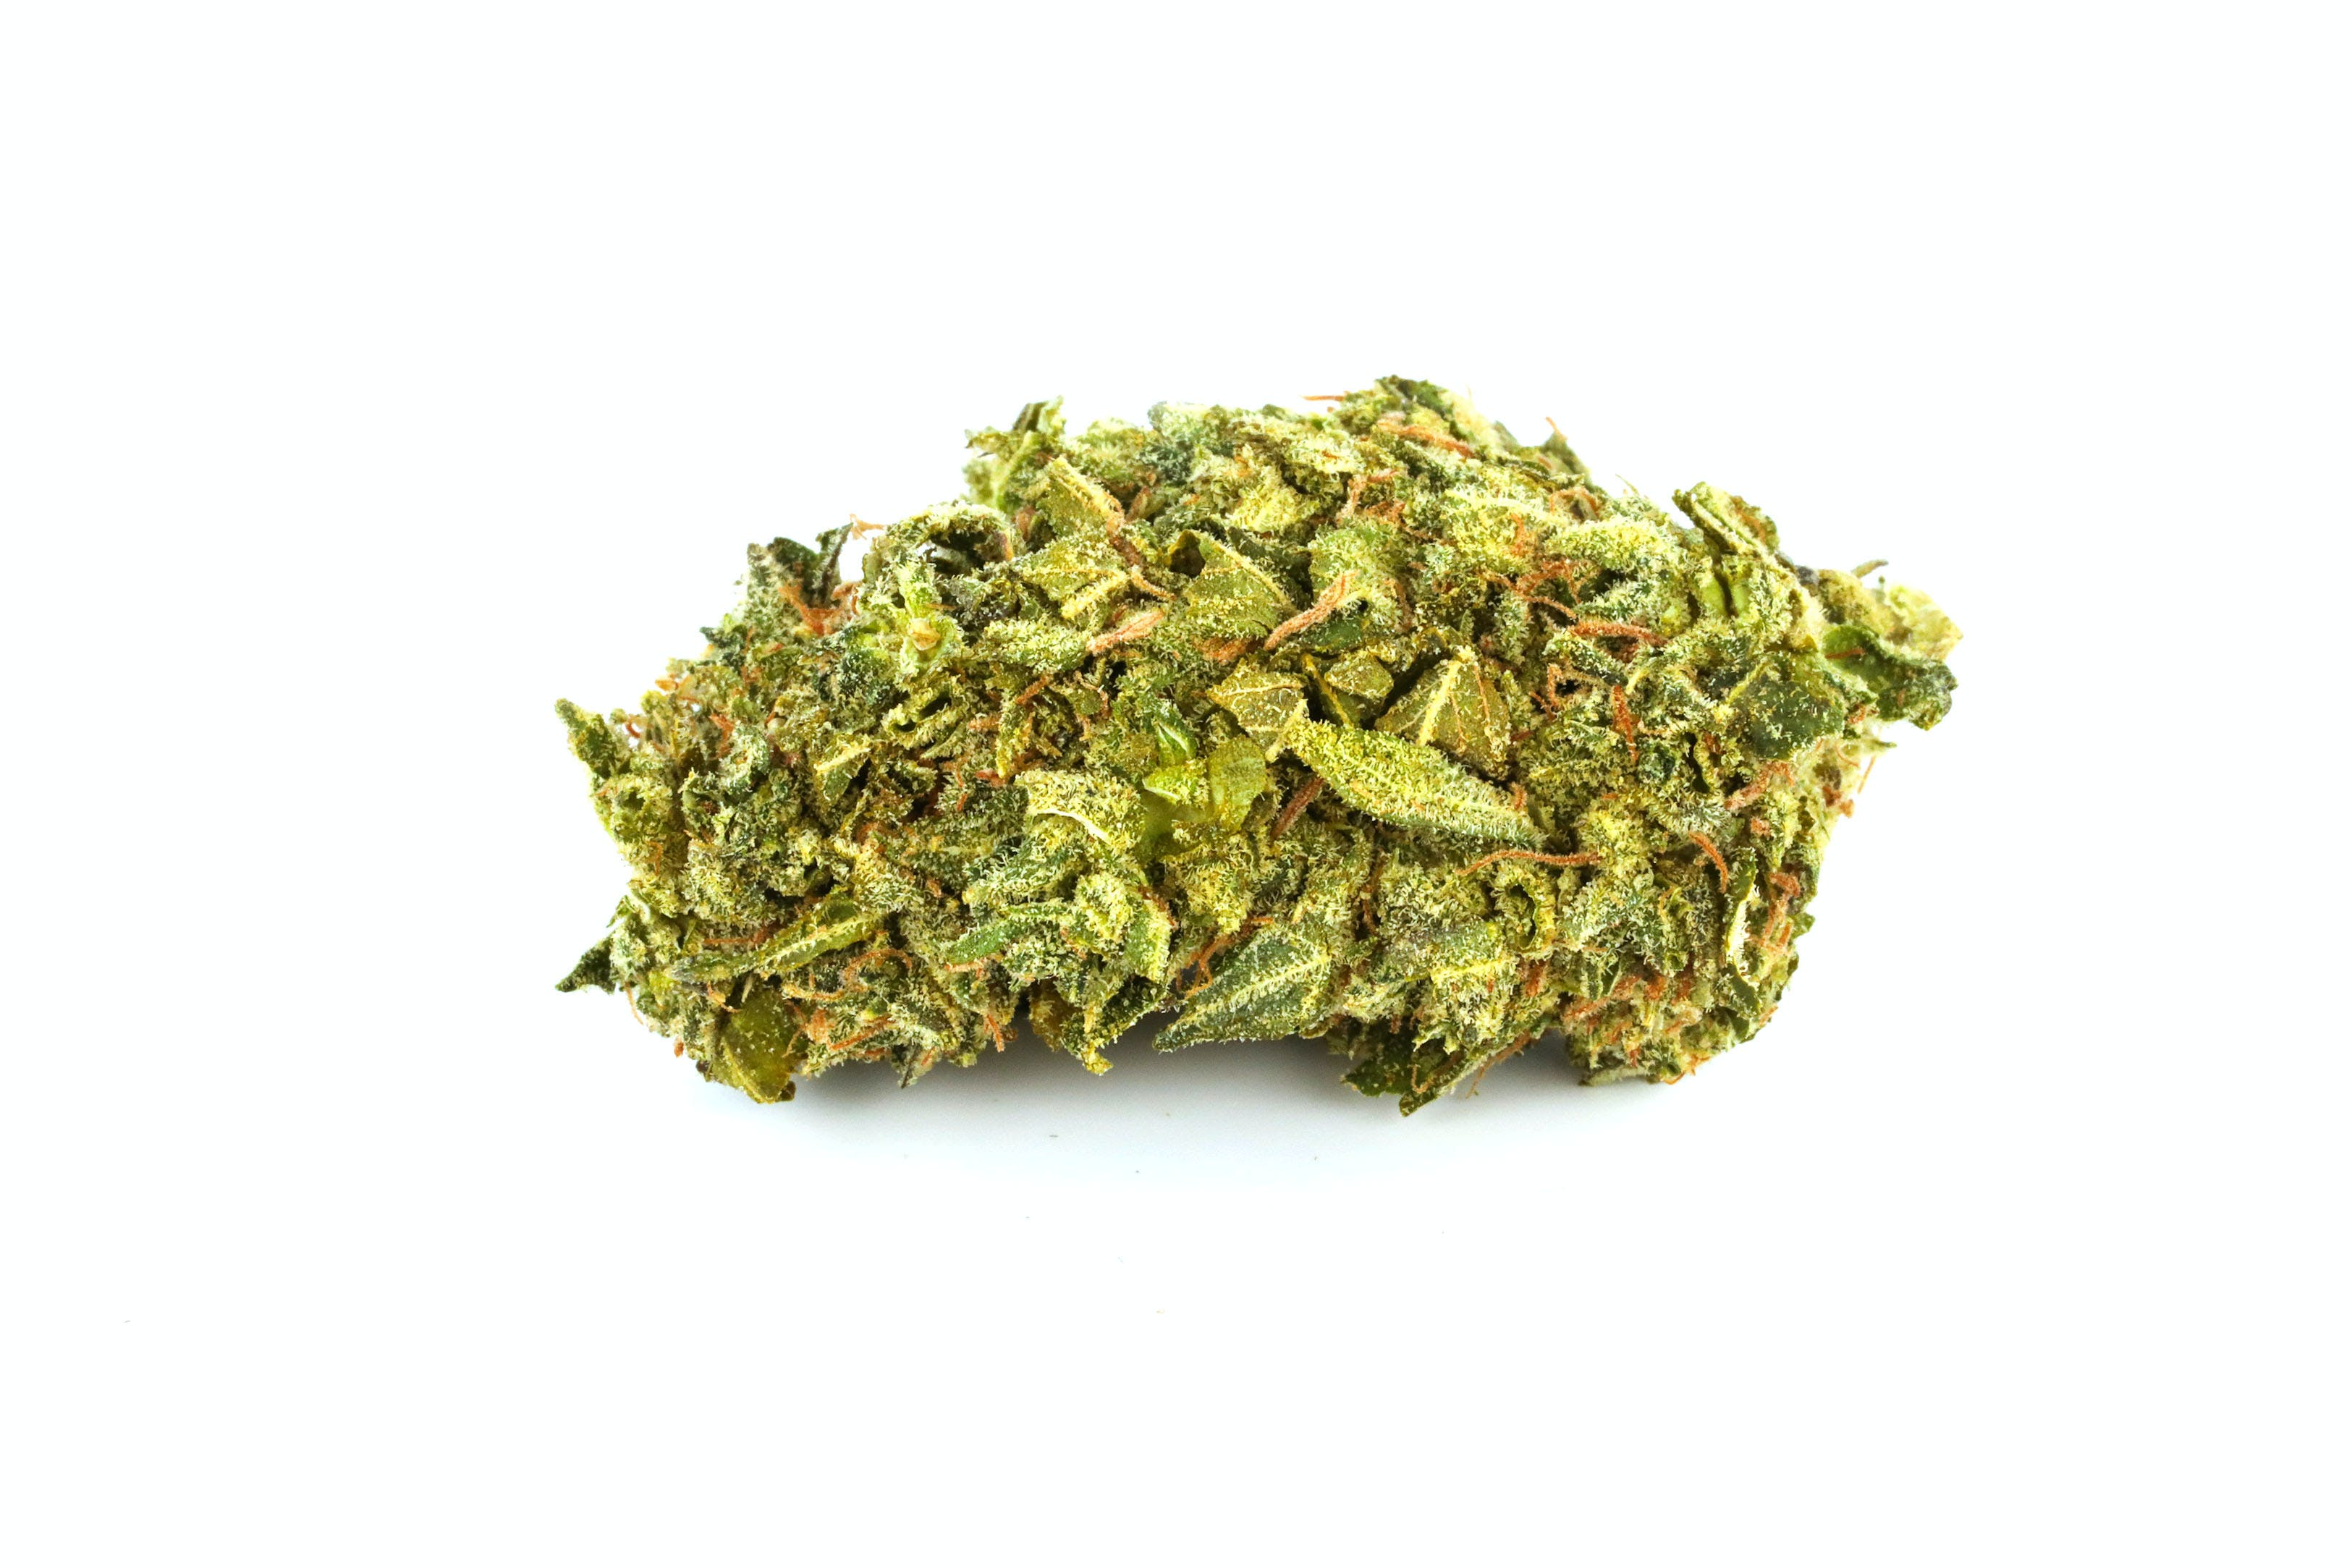 Sour OG Weed; Sour OG Cannabis Strain; Sour OG Hybrid Marijuana Strain